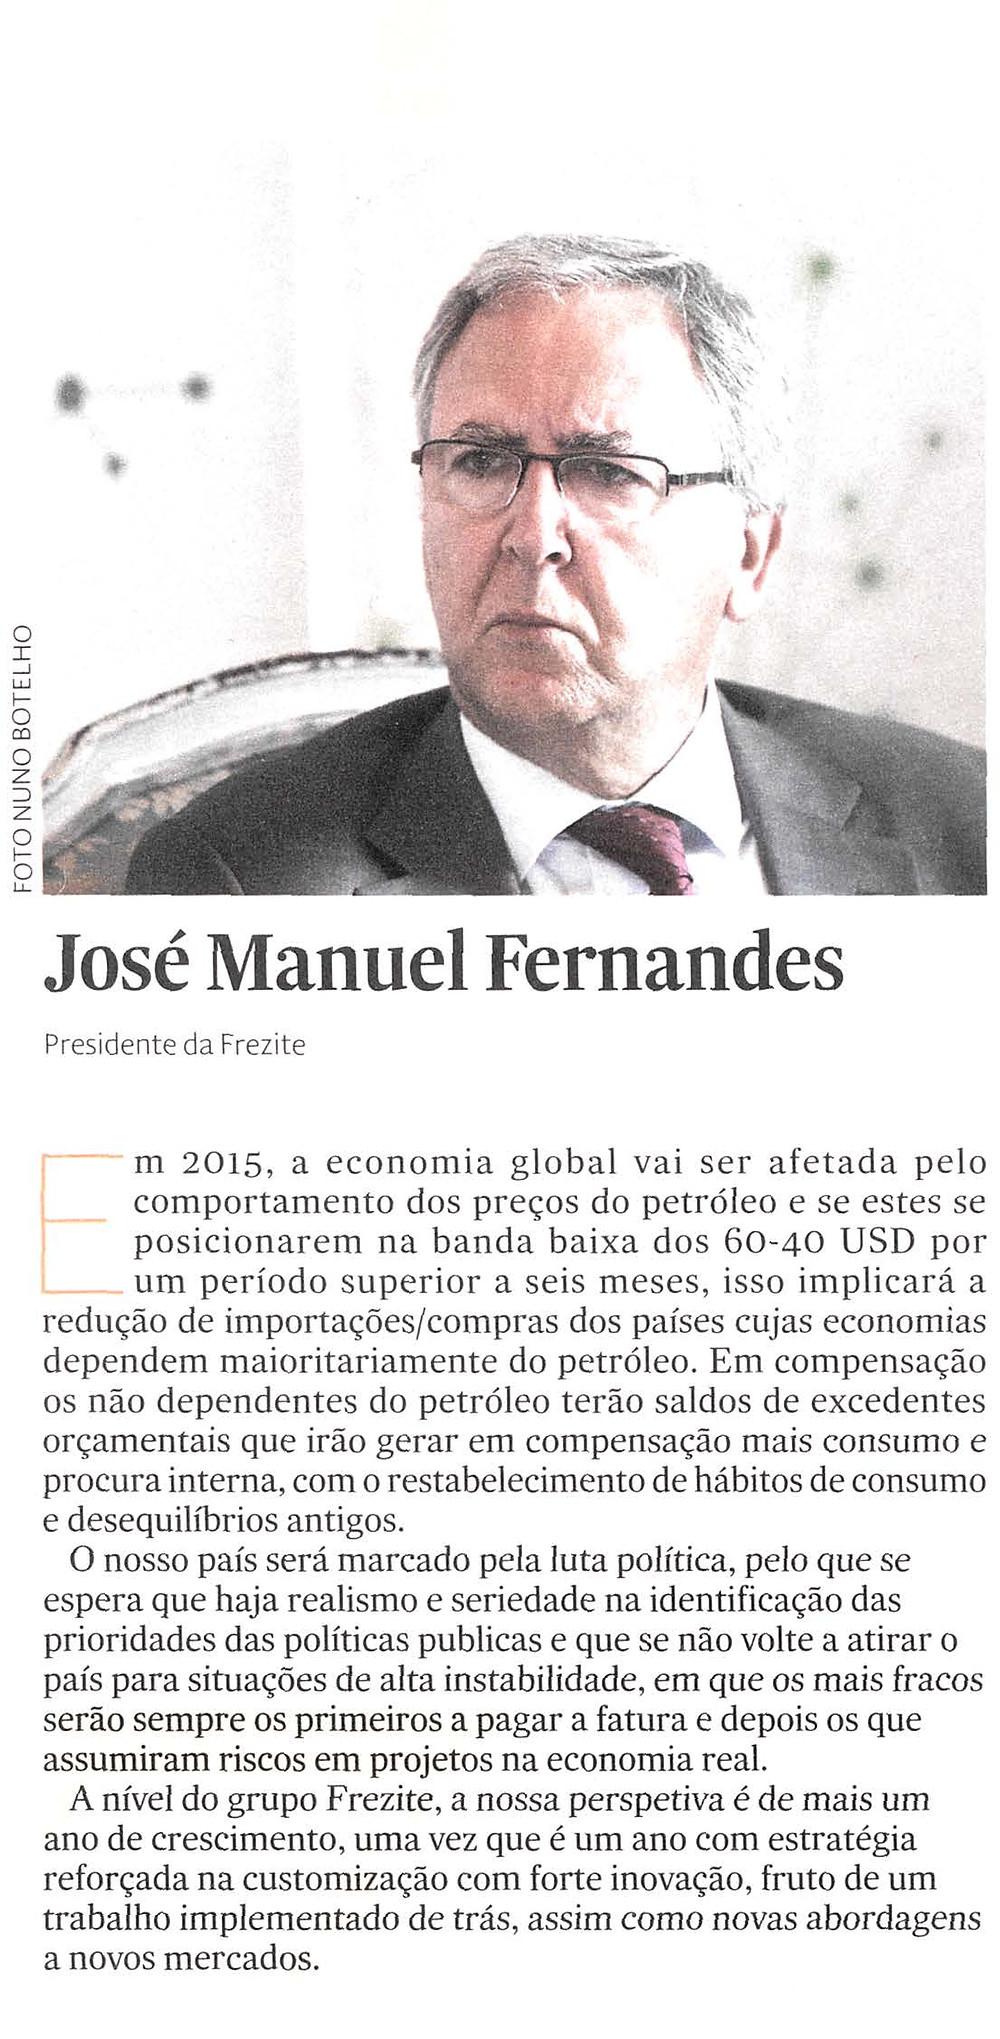 JMF Presidente da FREZITE.jpg